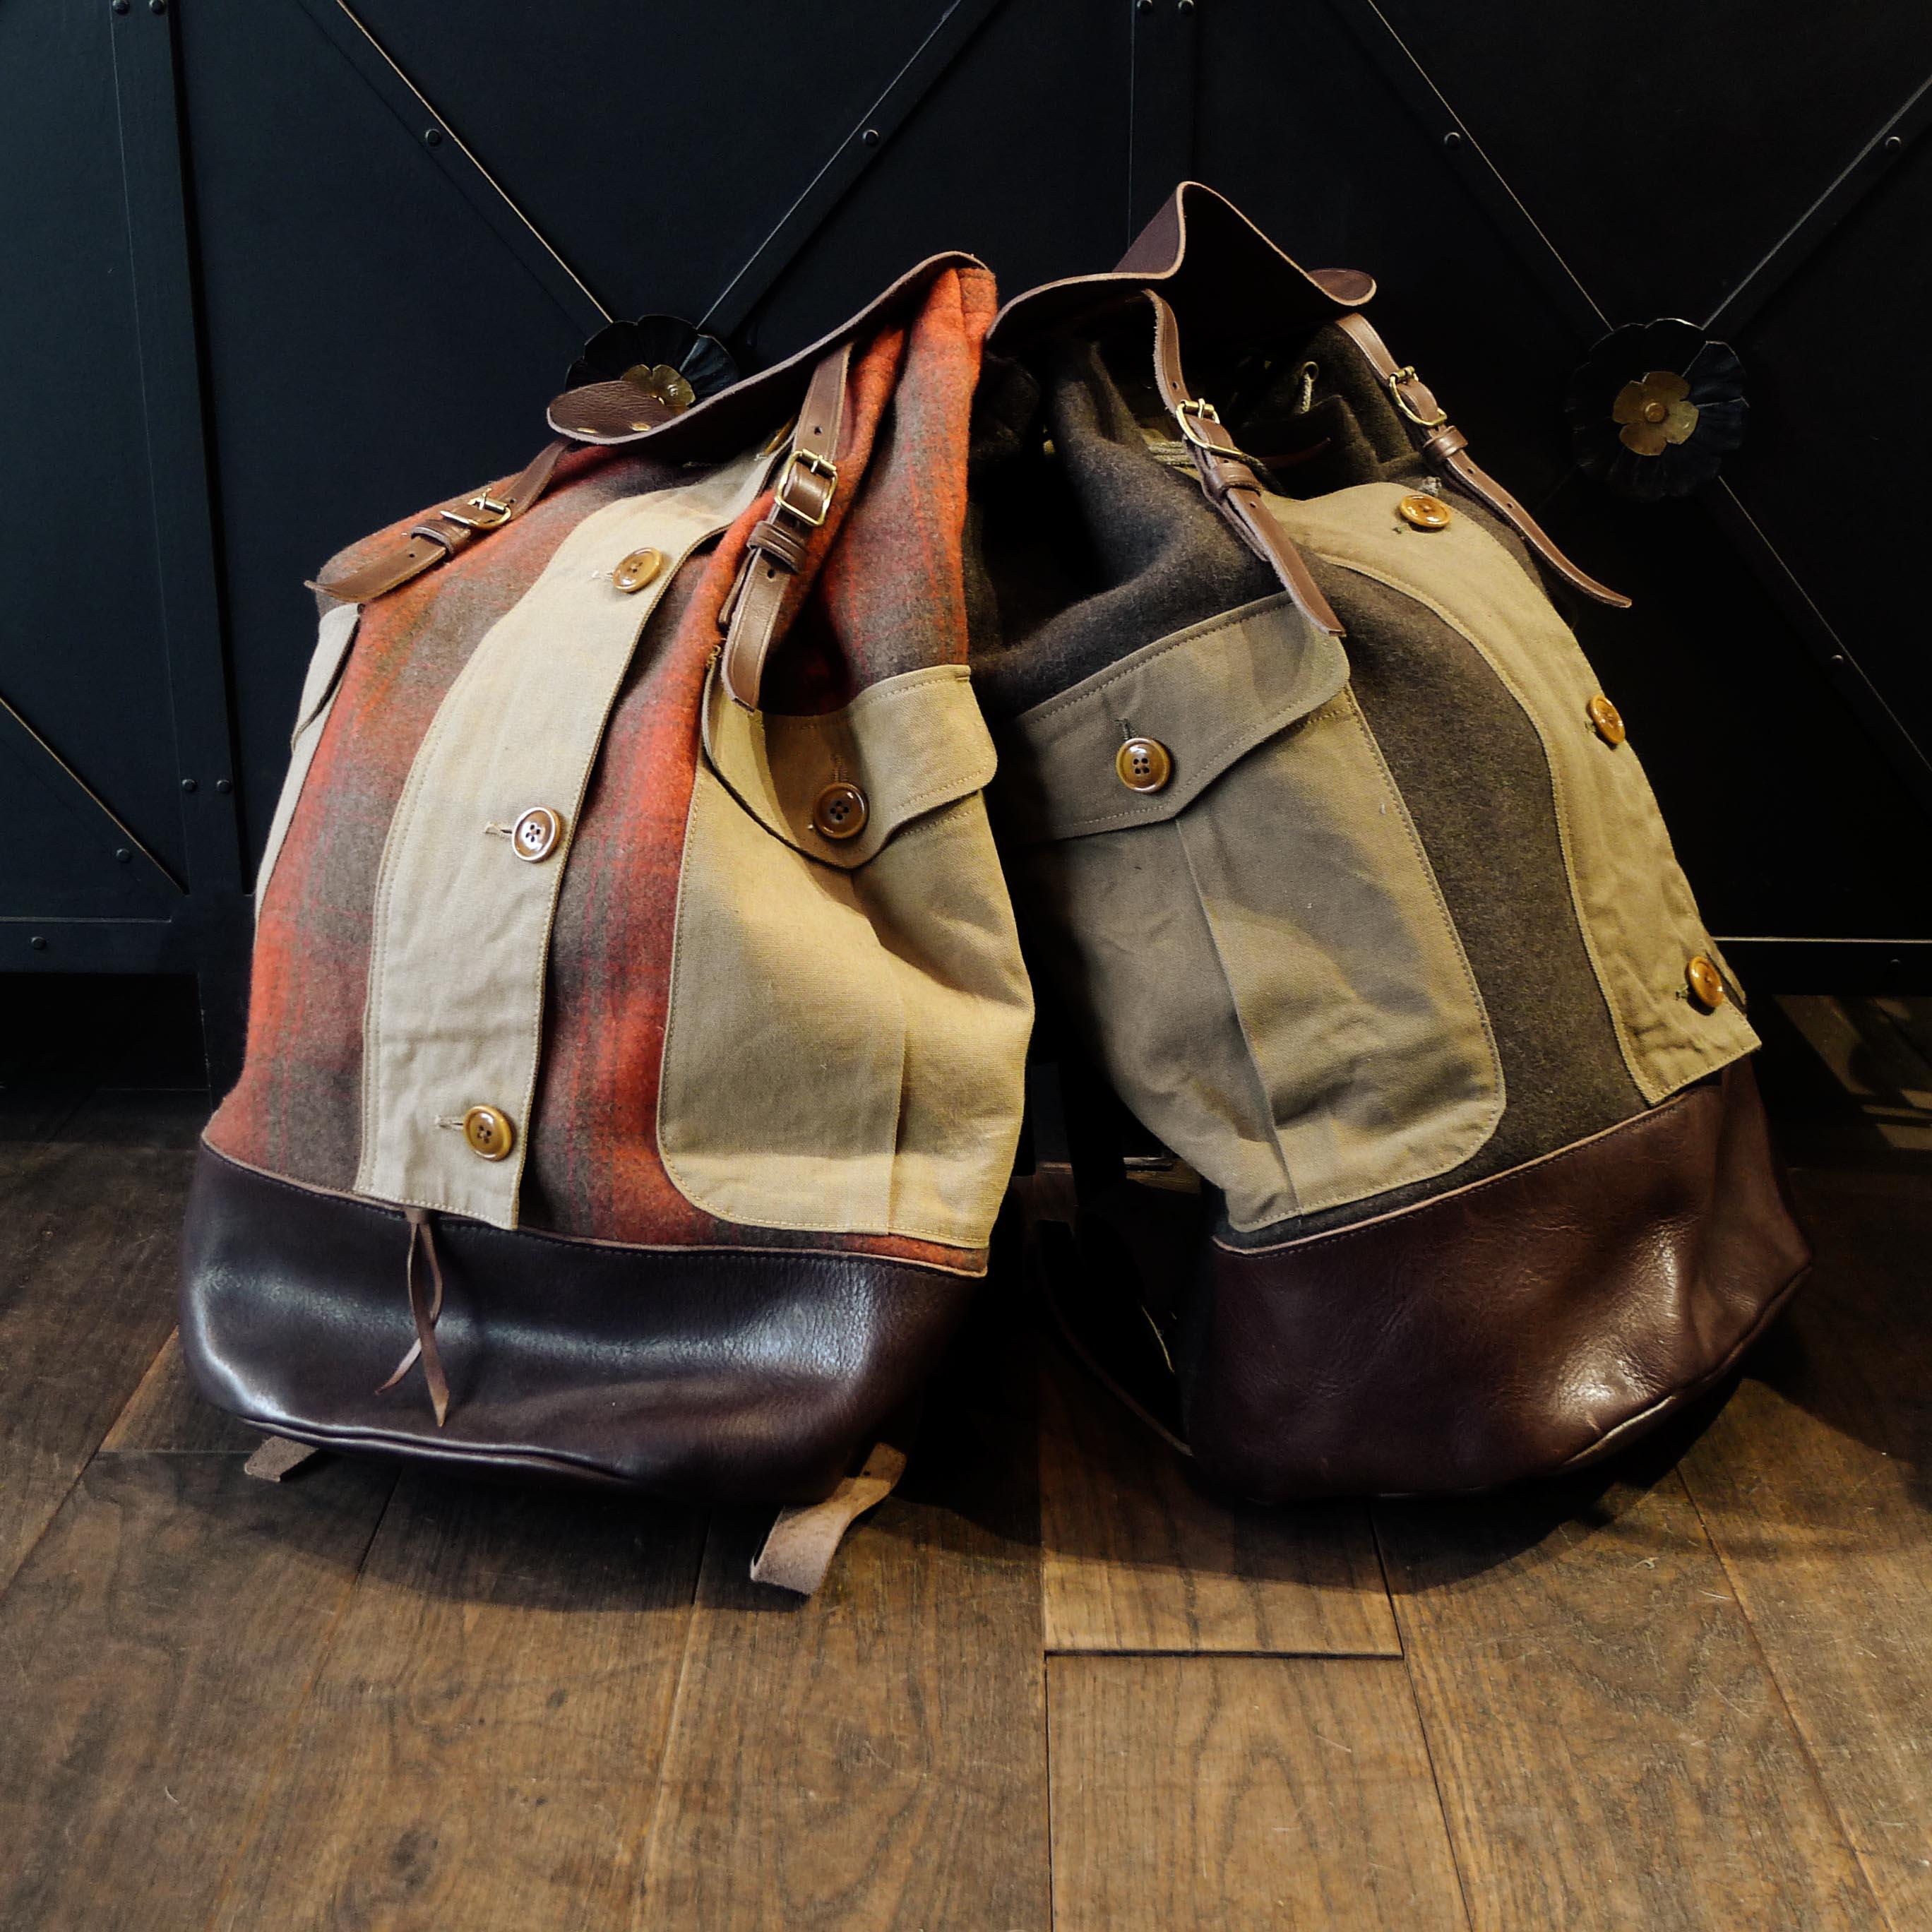 superiorlabor-rucksack-01